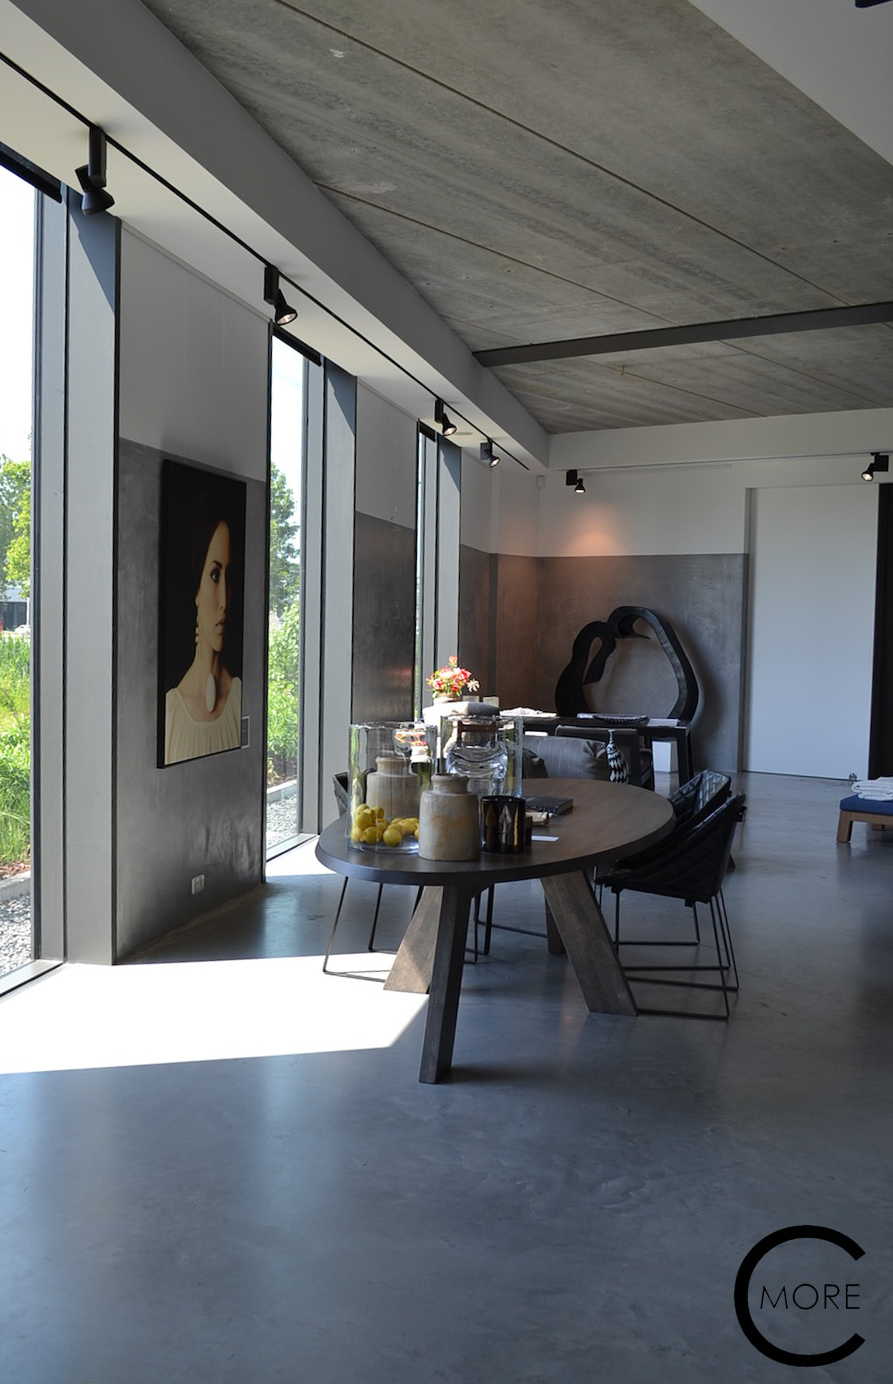 C more interieuradvies blog interior and design blog piet for Interieur ontwerpers